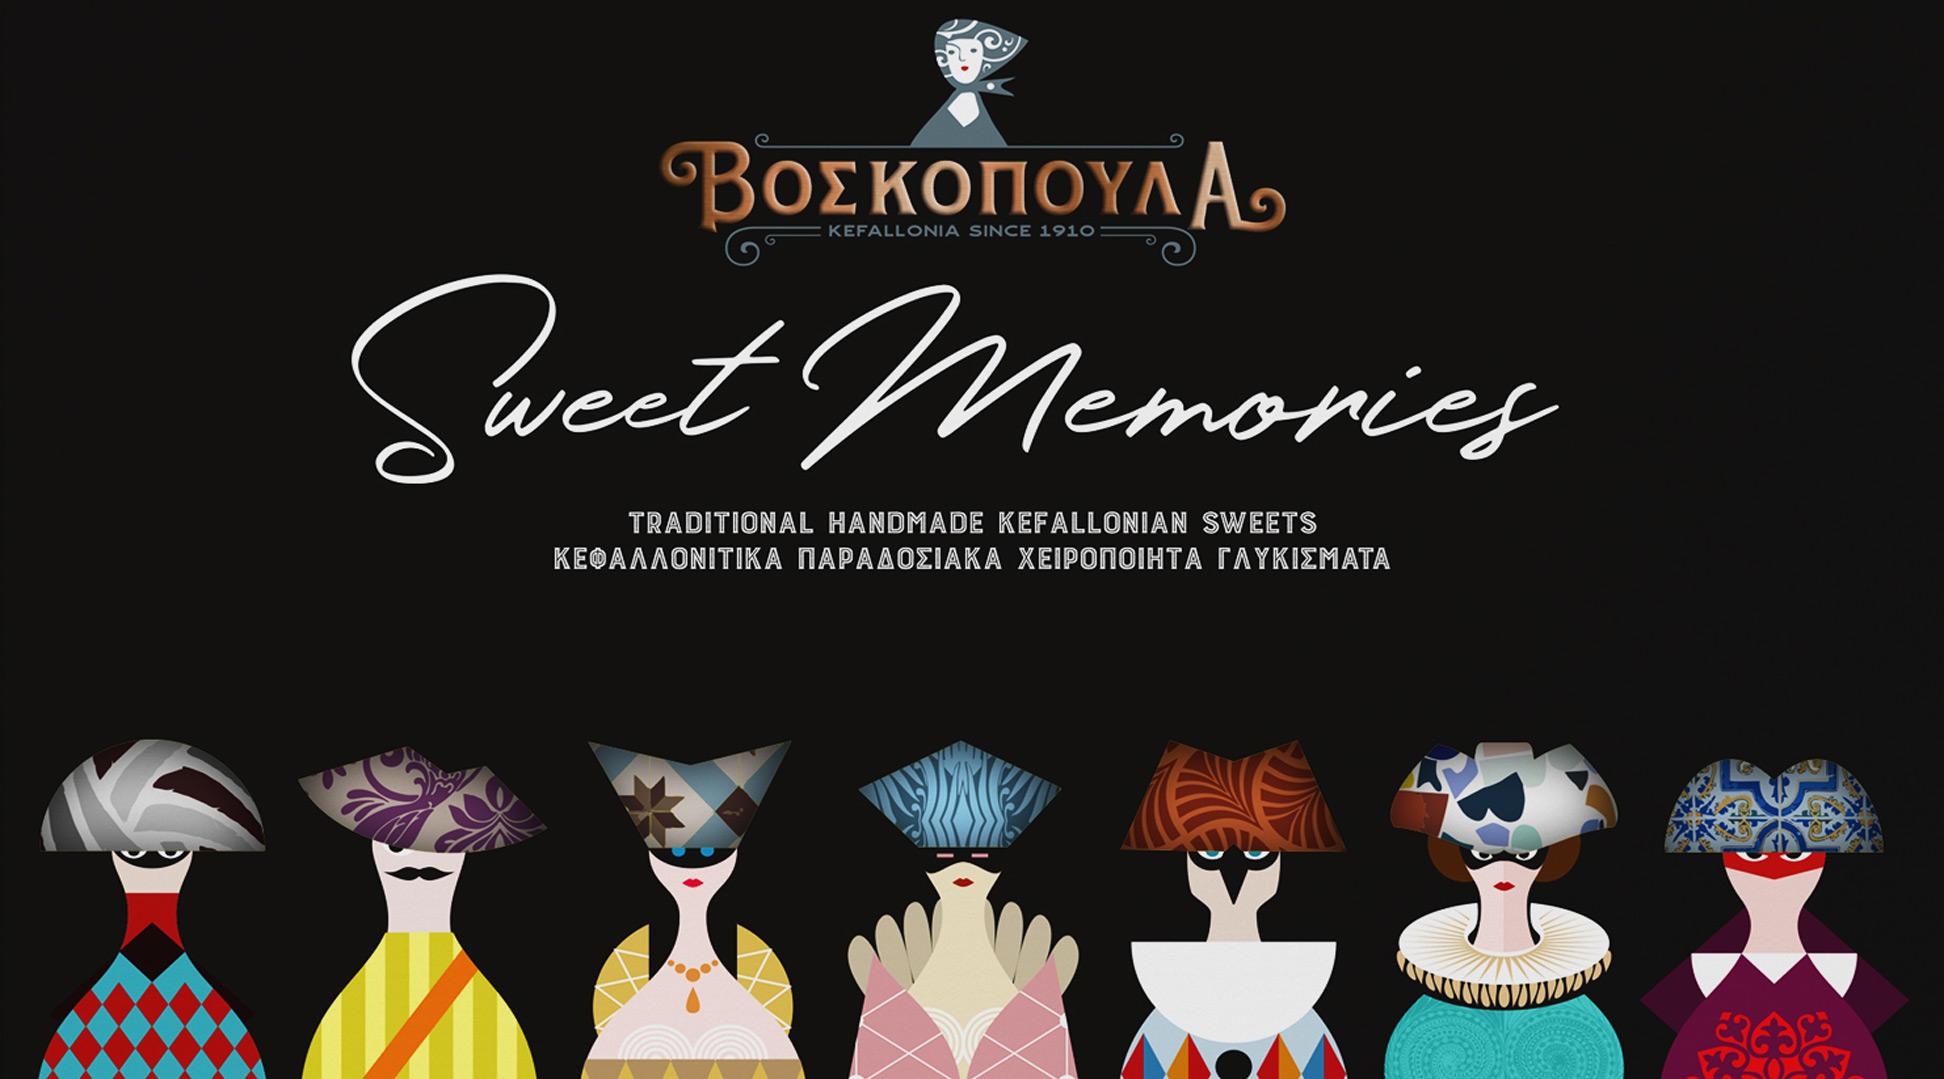 sweet_memories_kefalonia_products